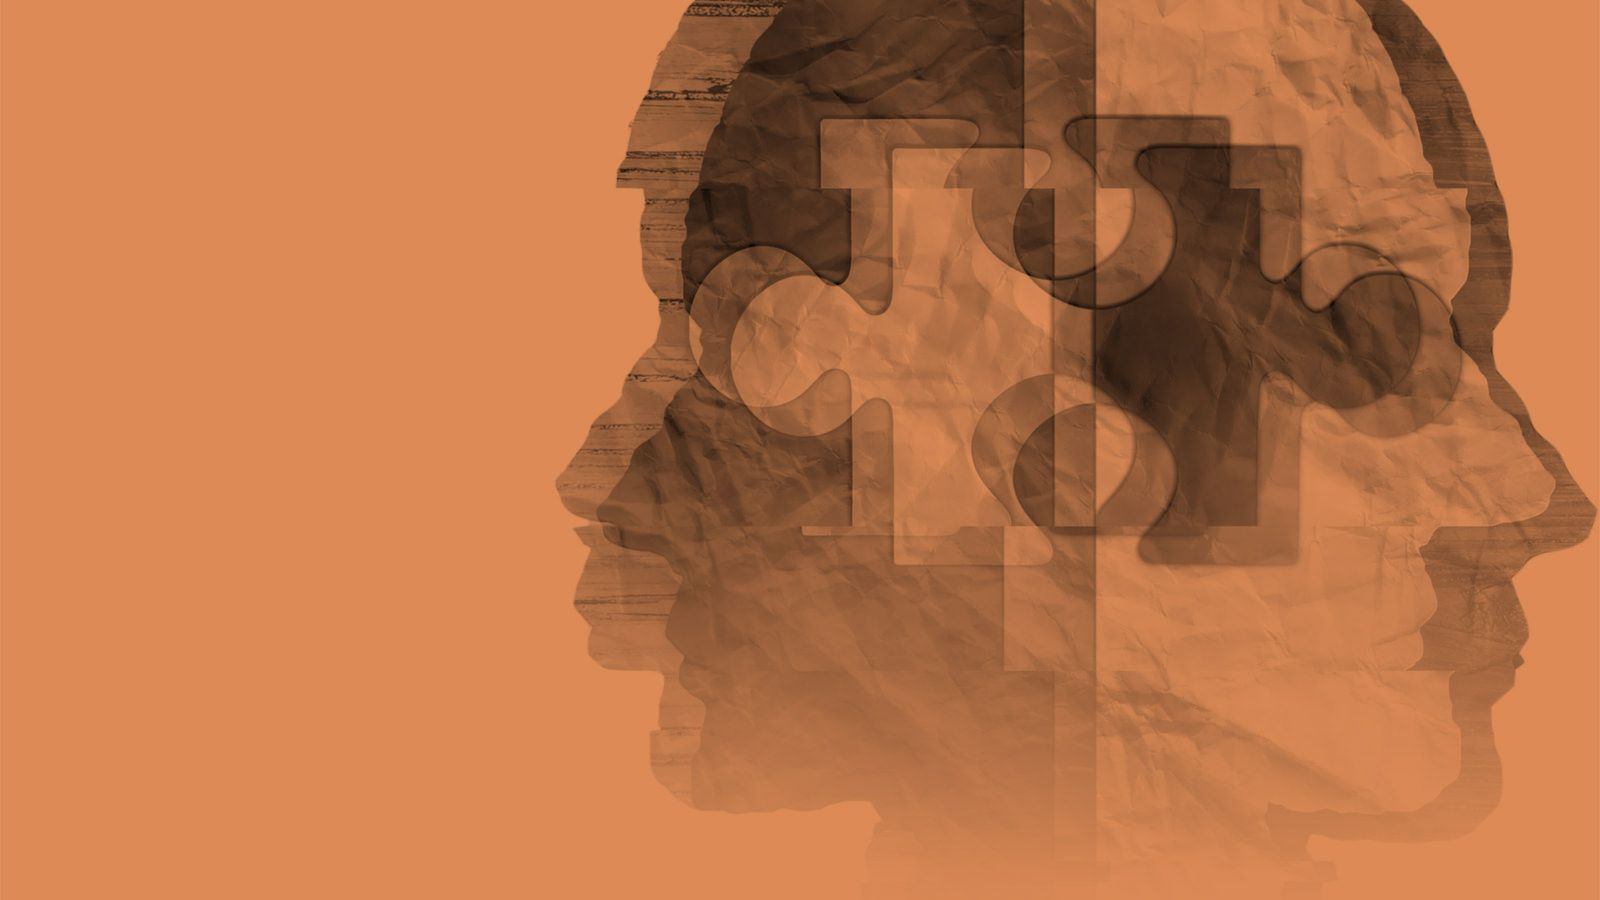 dublab Dialog - Dismantling Racism w/ Bebero Lehmann, Sandra Karangwa und Kurt Tallert